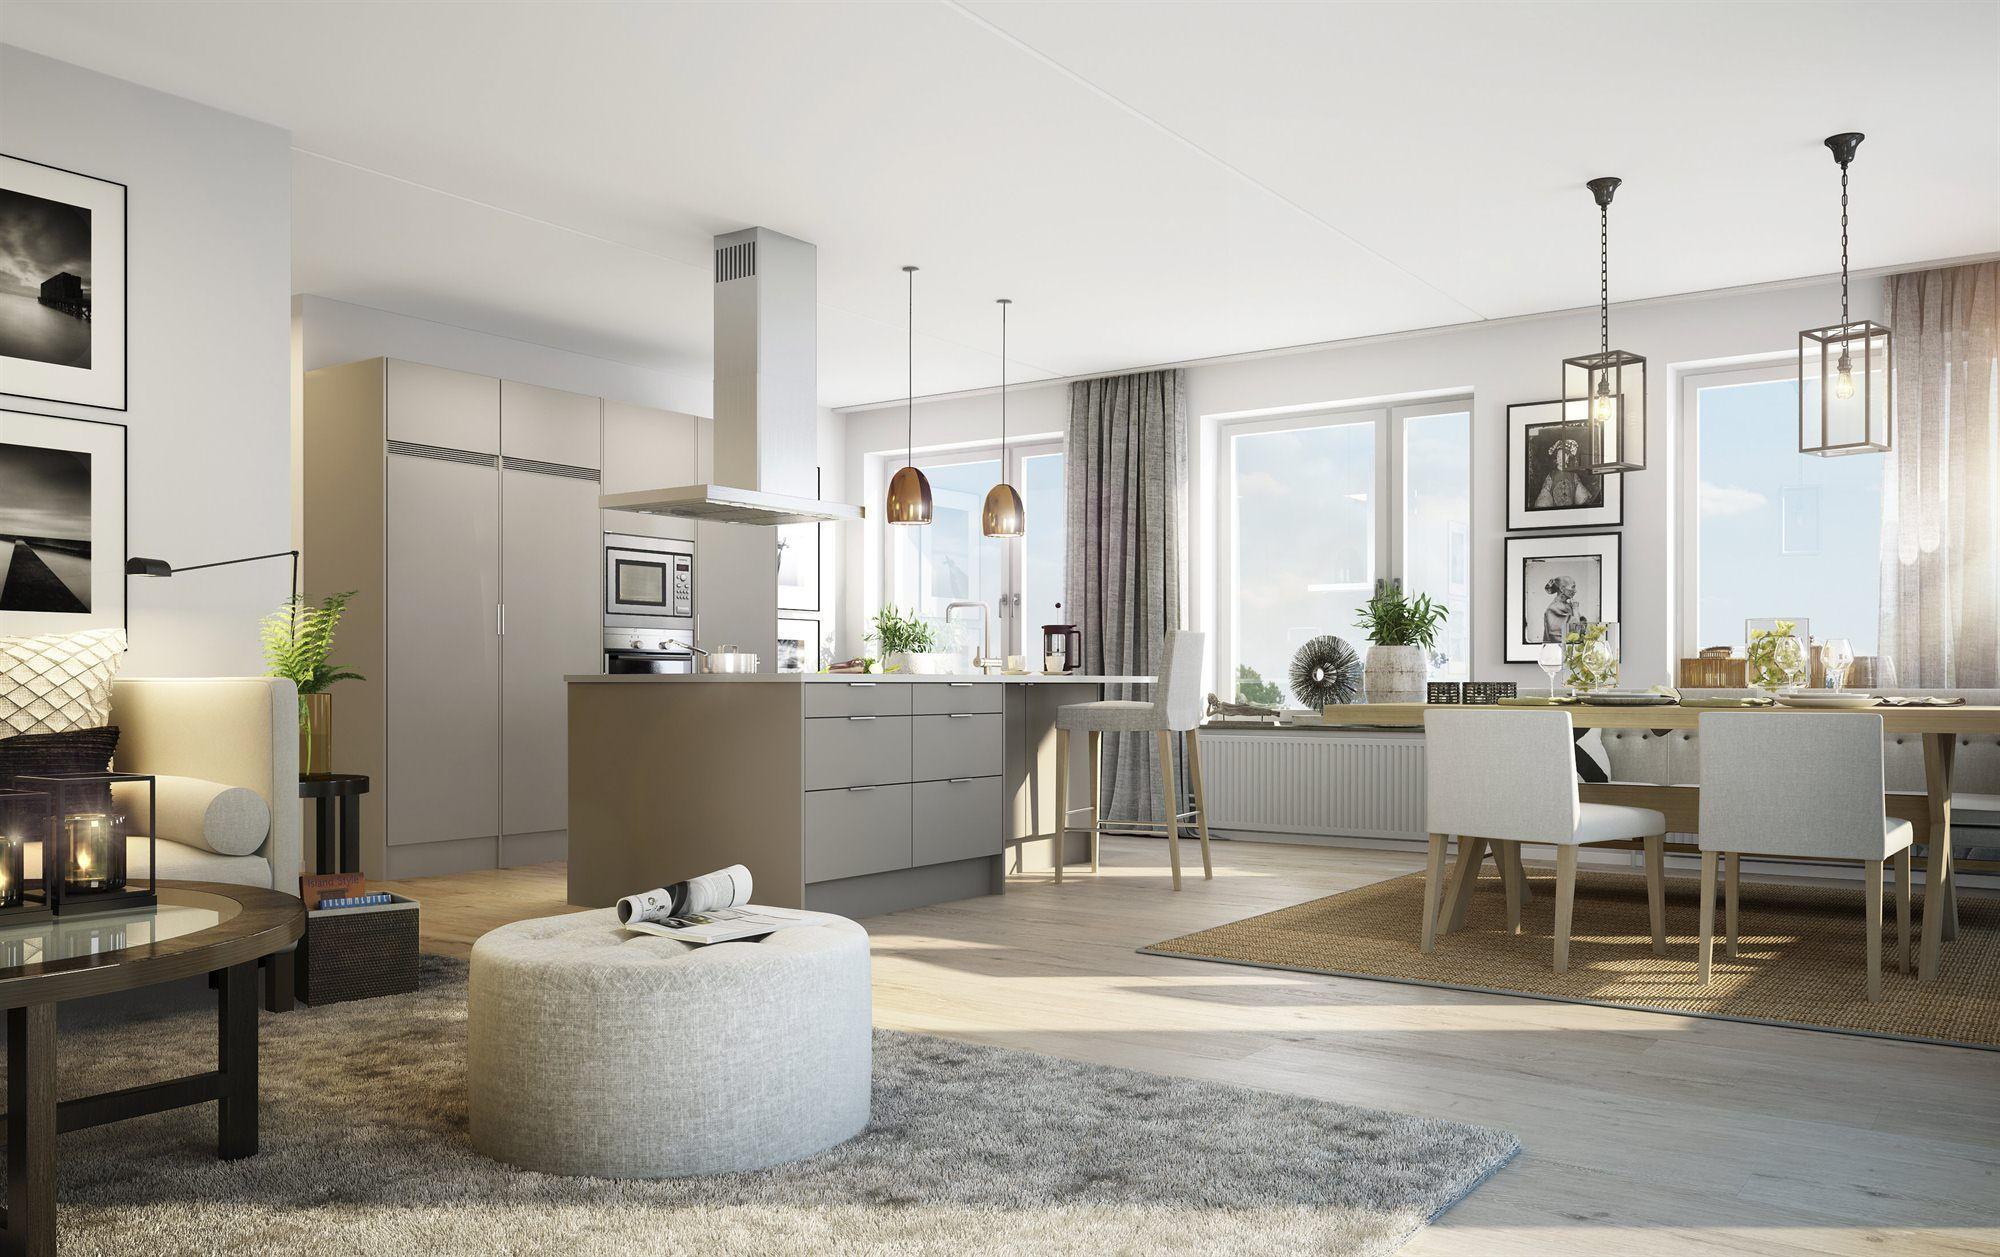 Wohnzimmer Lumen ~ Lumen penthouse fantastic frank kitchen pinterest penthouses